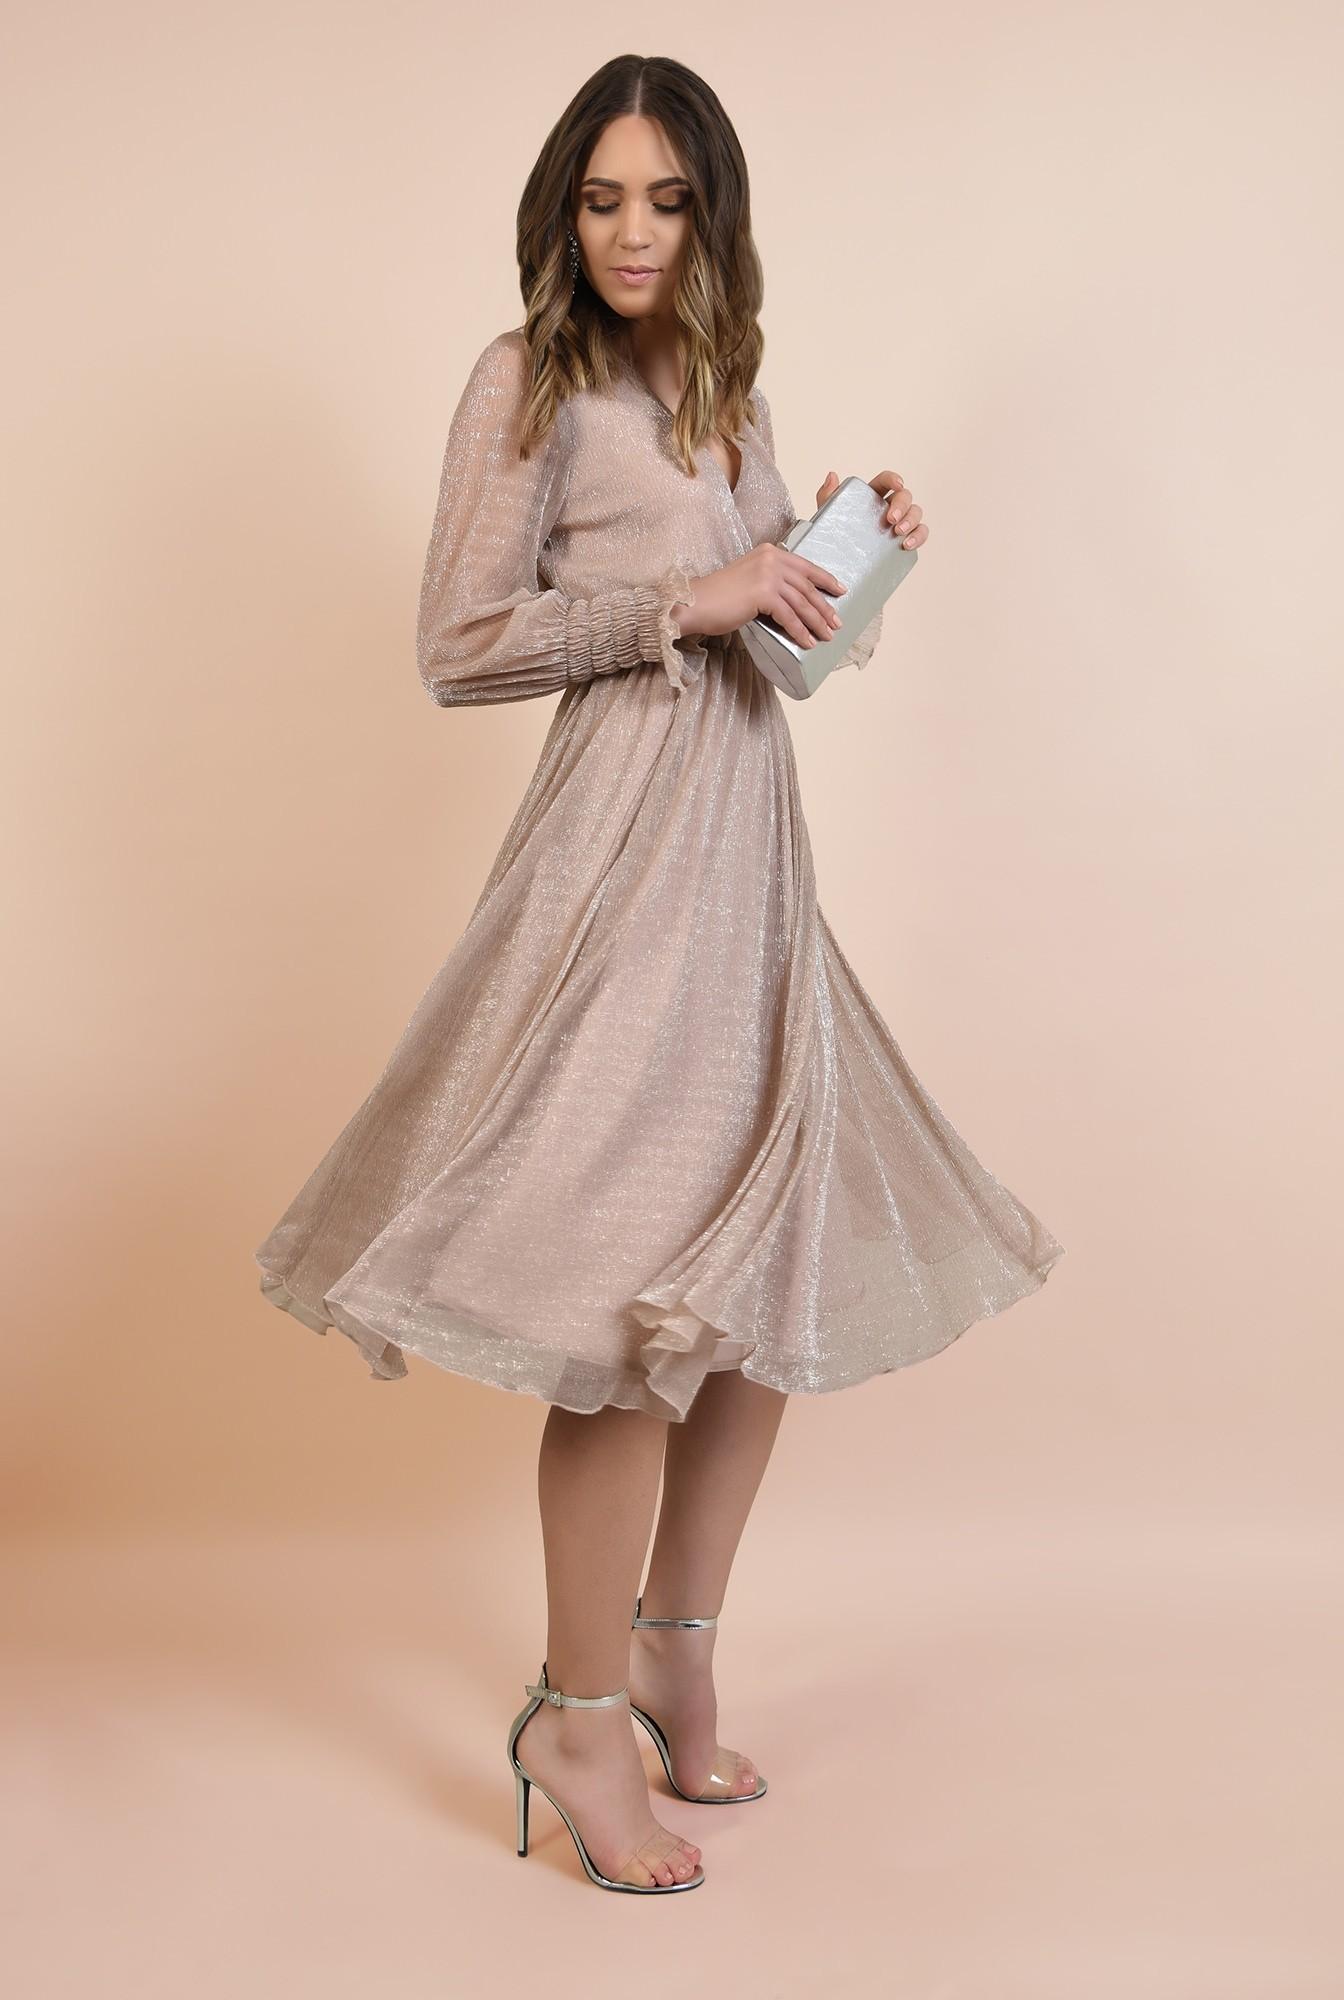 3 - 360 - rochie de seara, midi, clos, anchior petrecut, mansete fantezie